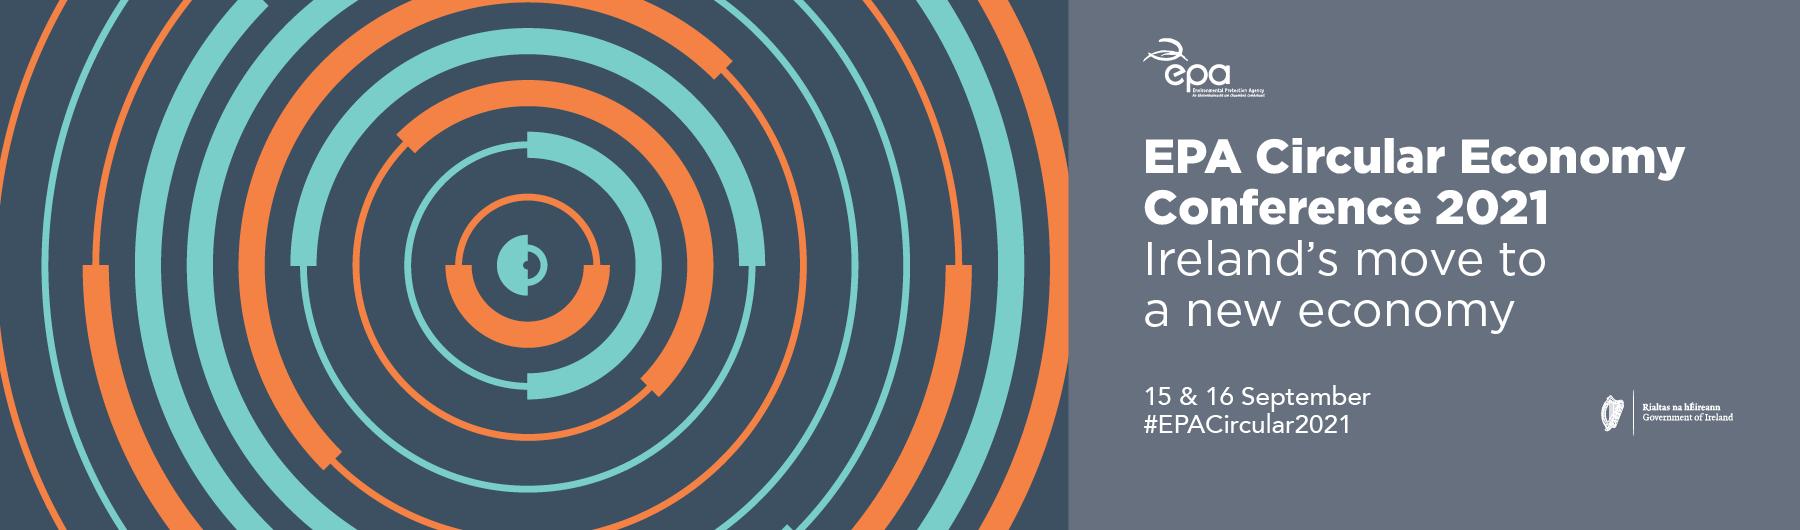 Circular Economy Conference 2021